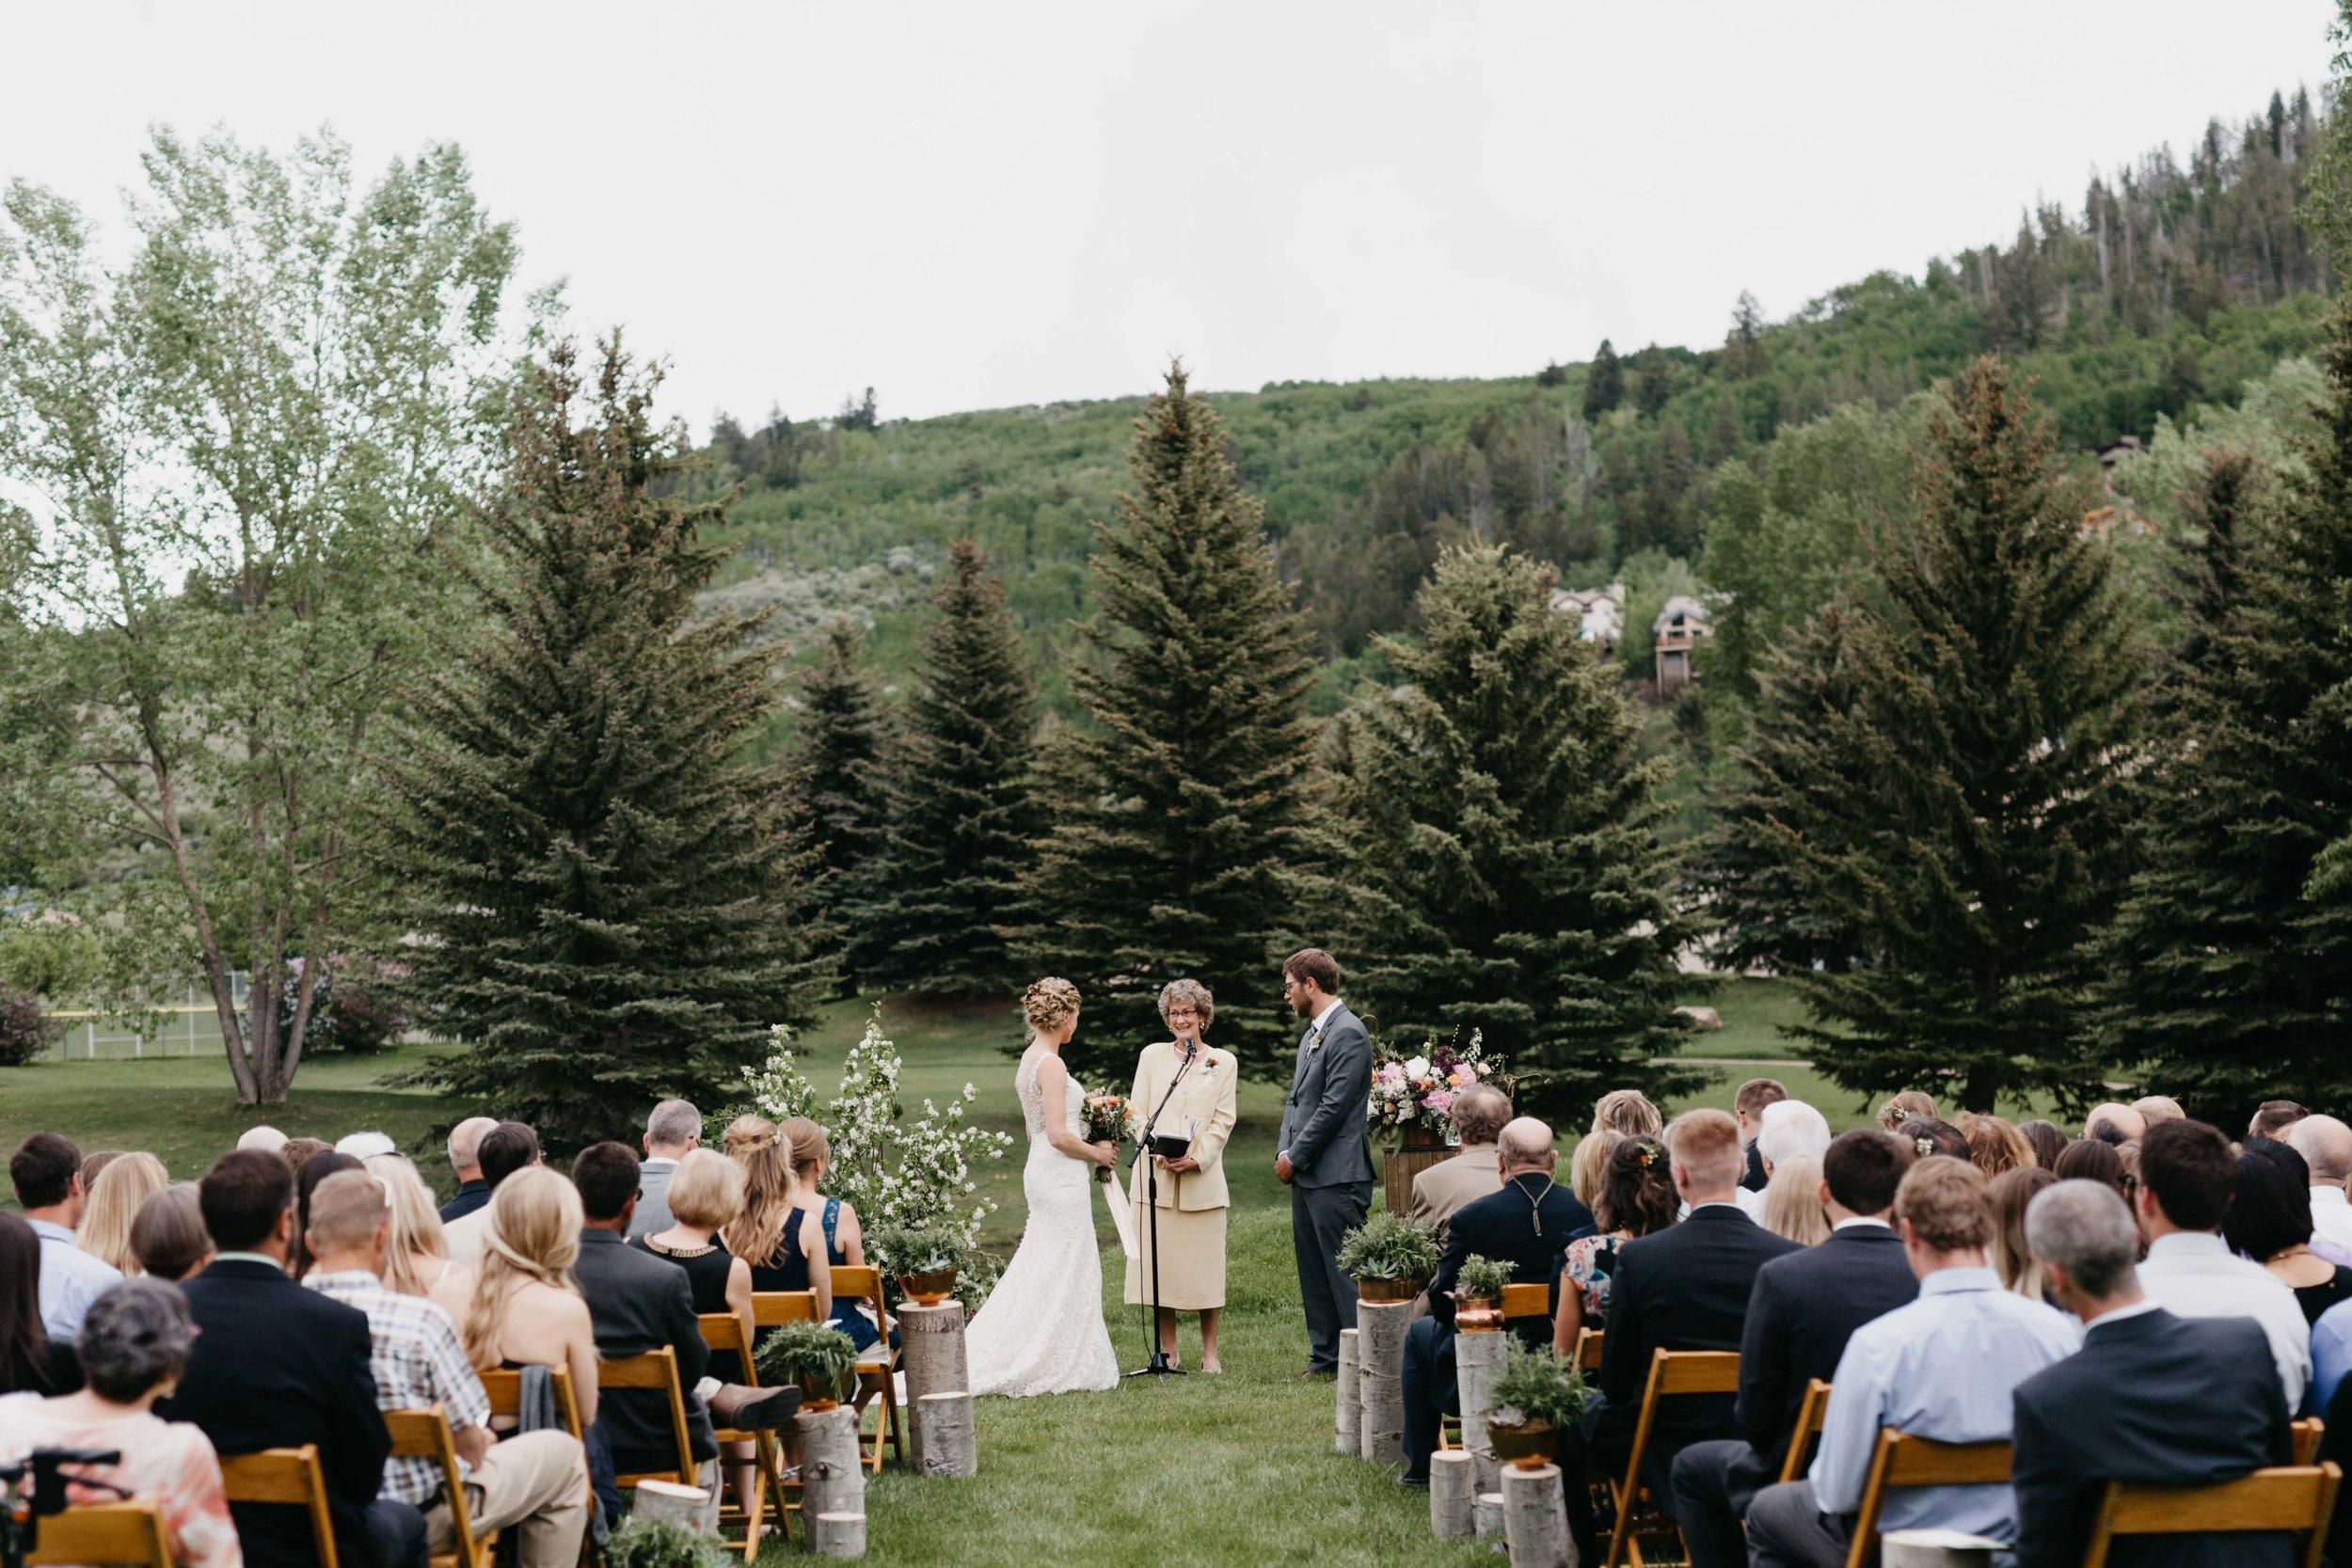 Colorado-Wedding-Photographer-56.jpg